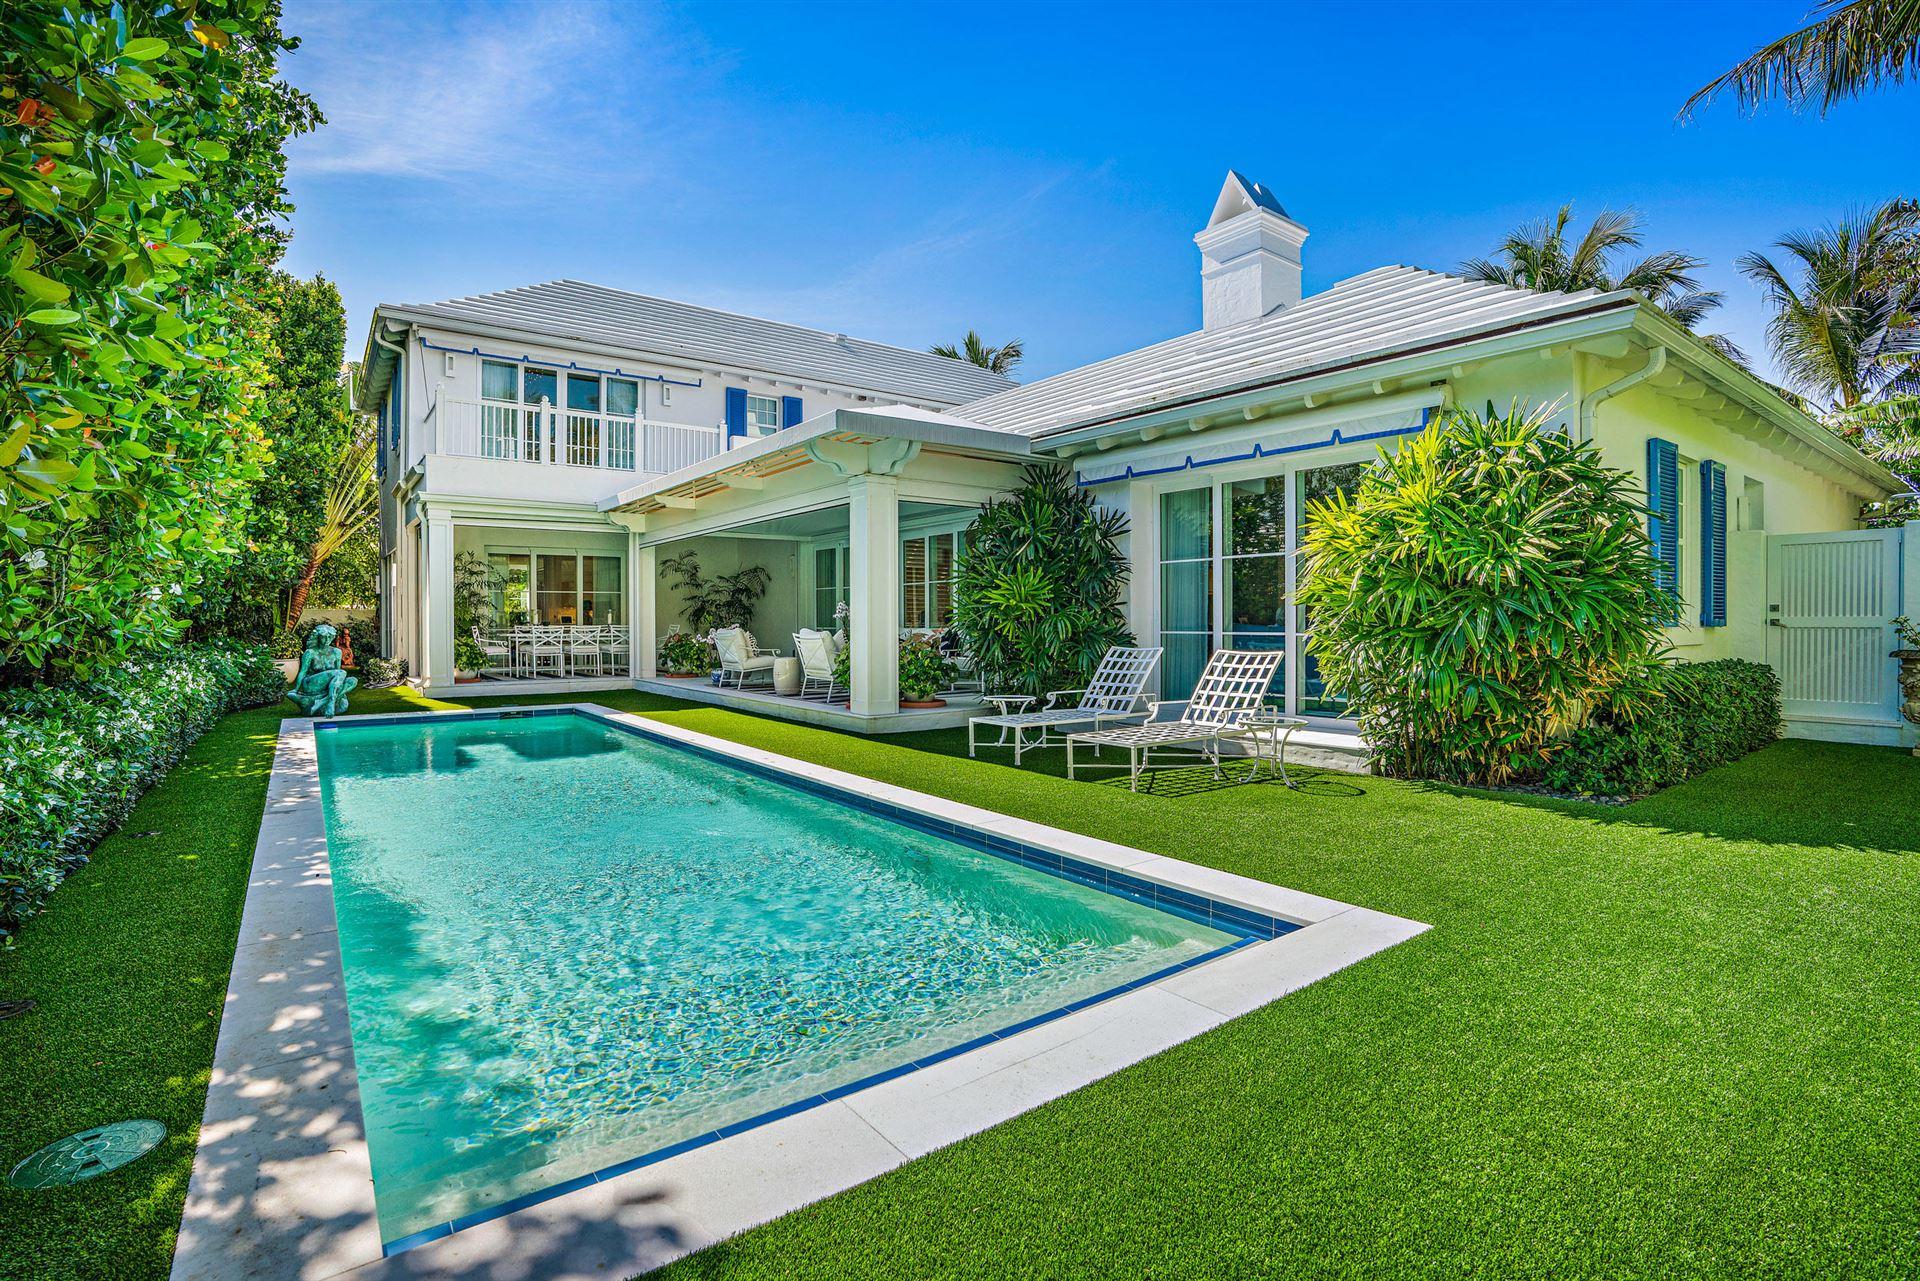 127 Reef Road, Palm Beach, FL 33480 - #: RX-10633424